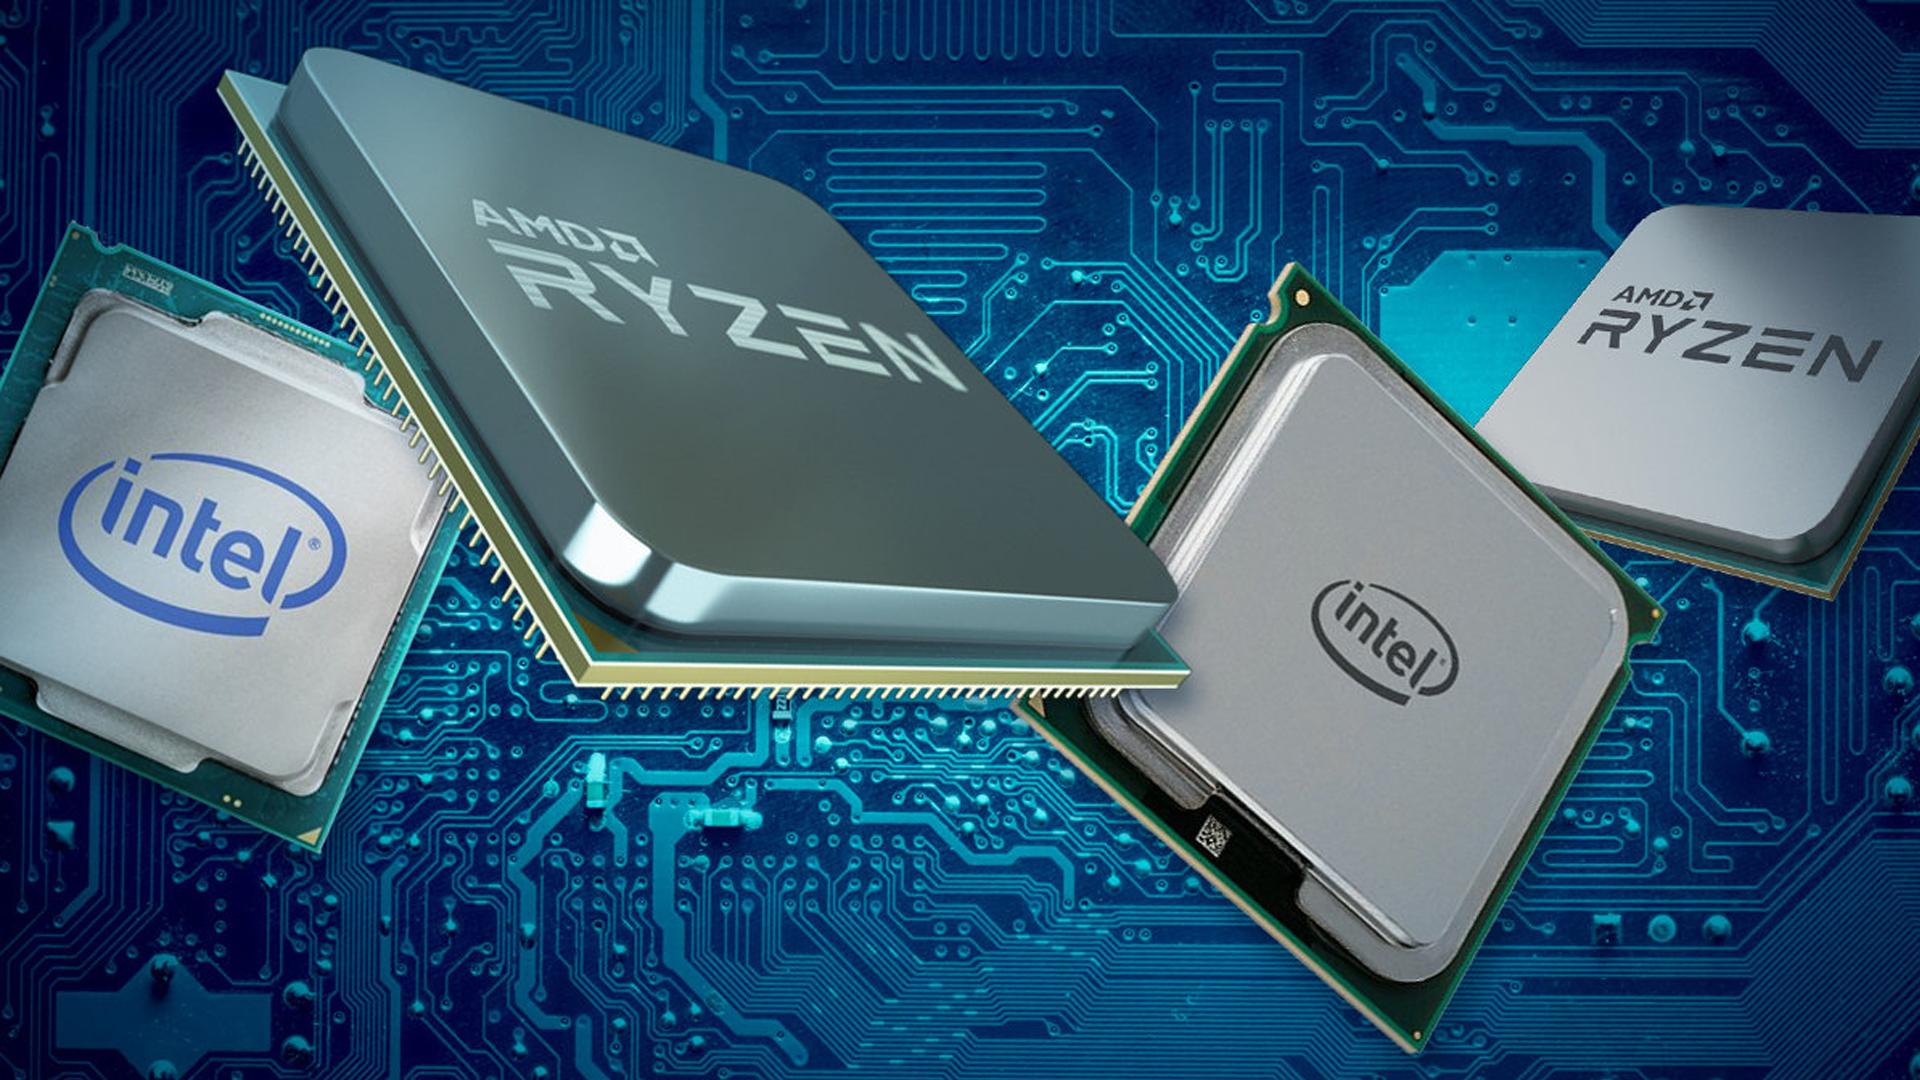 STEAM AMD INTEL